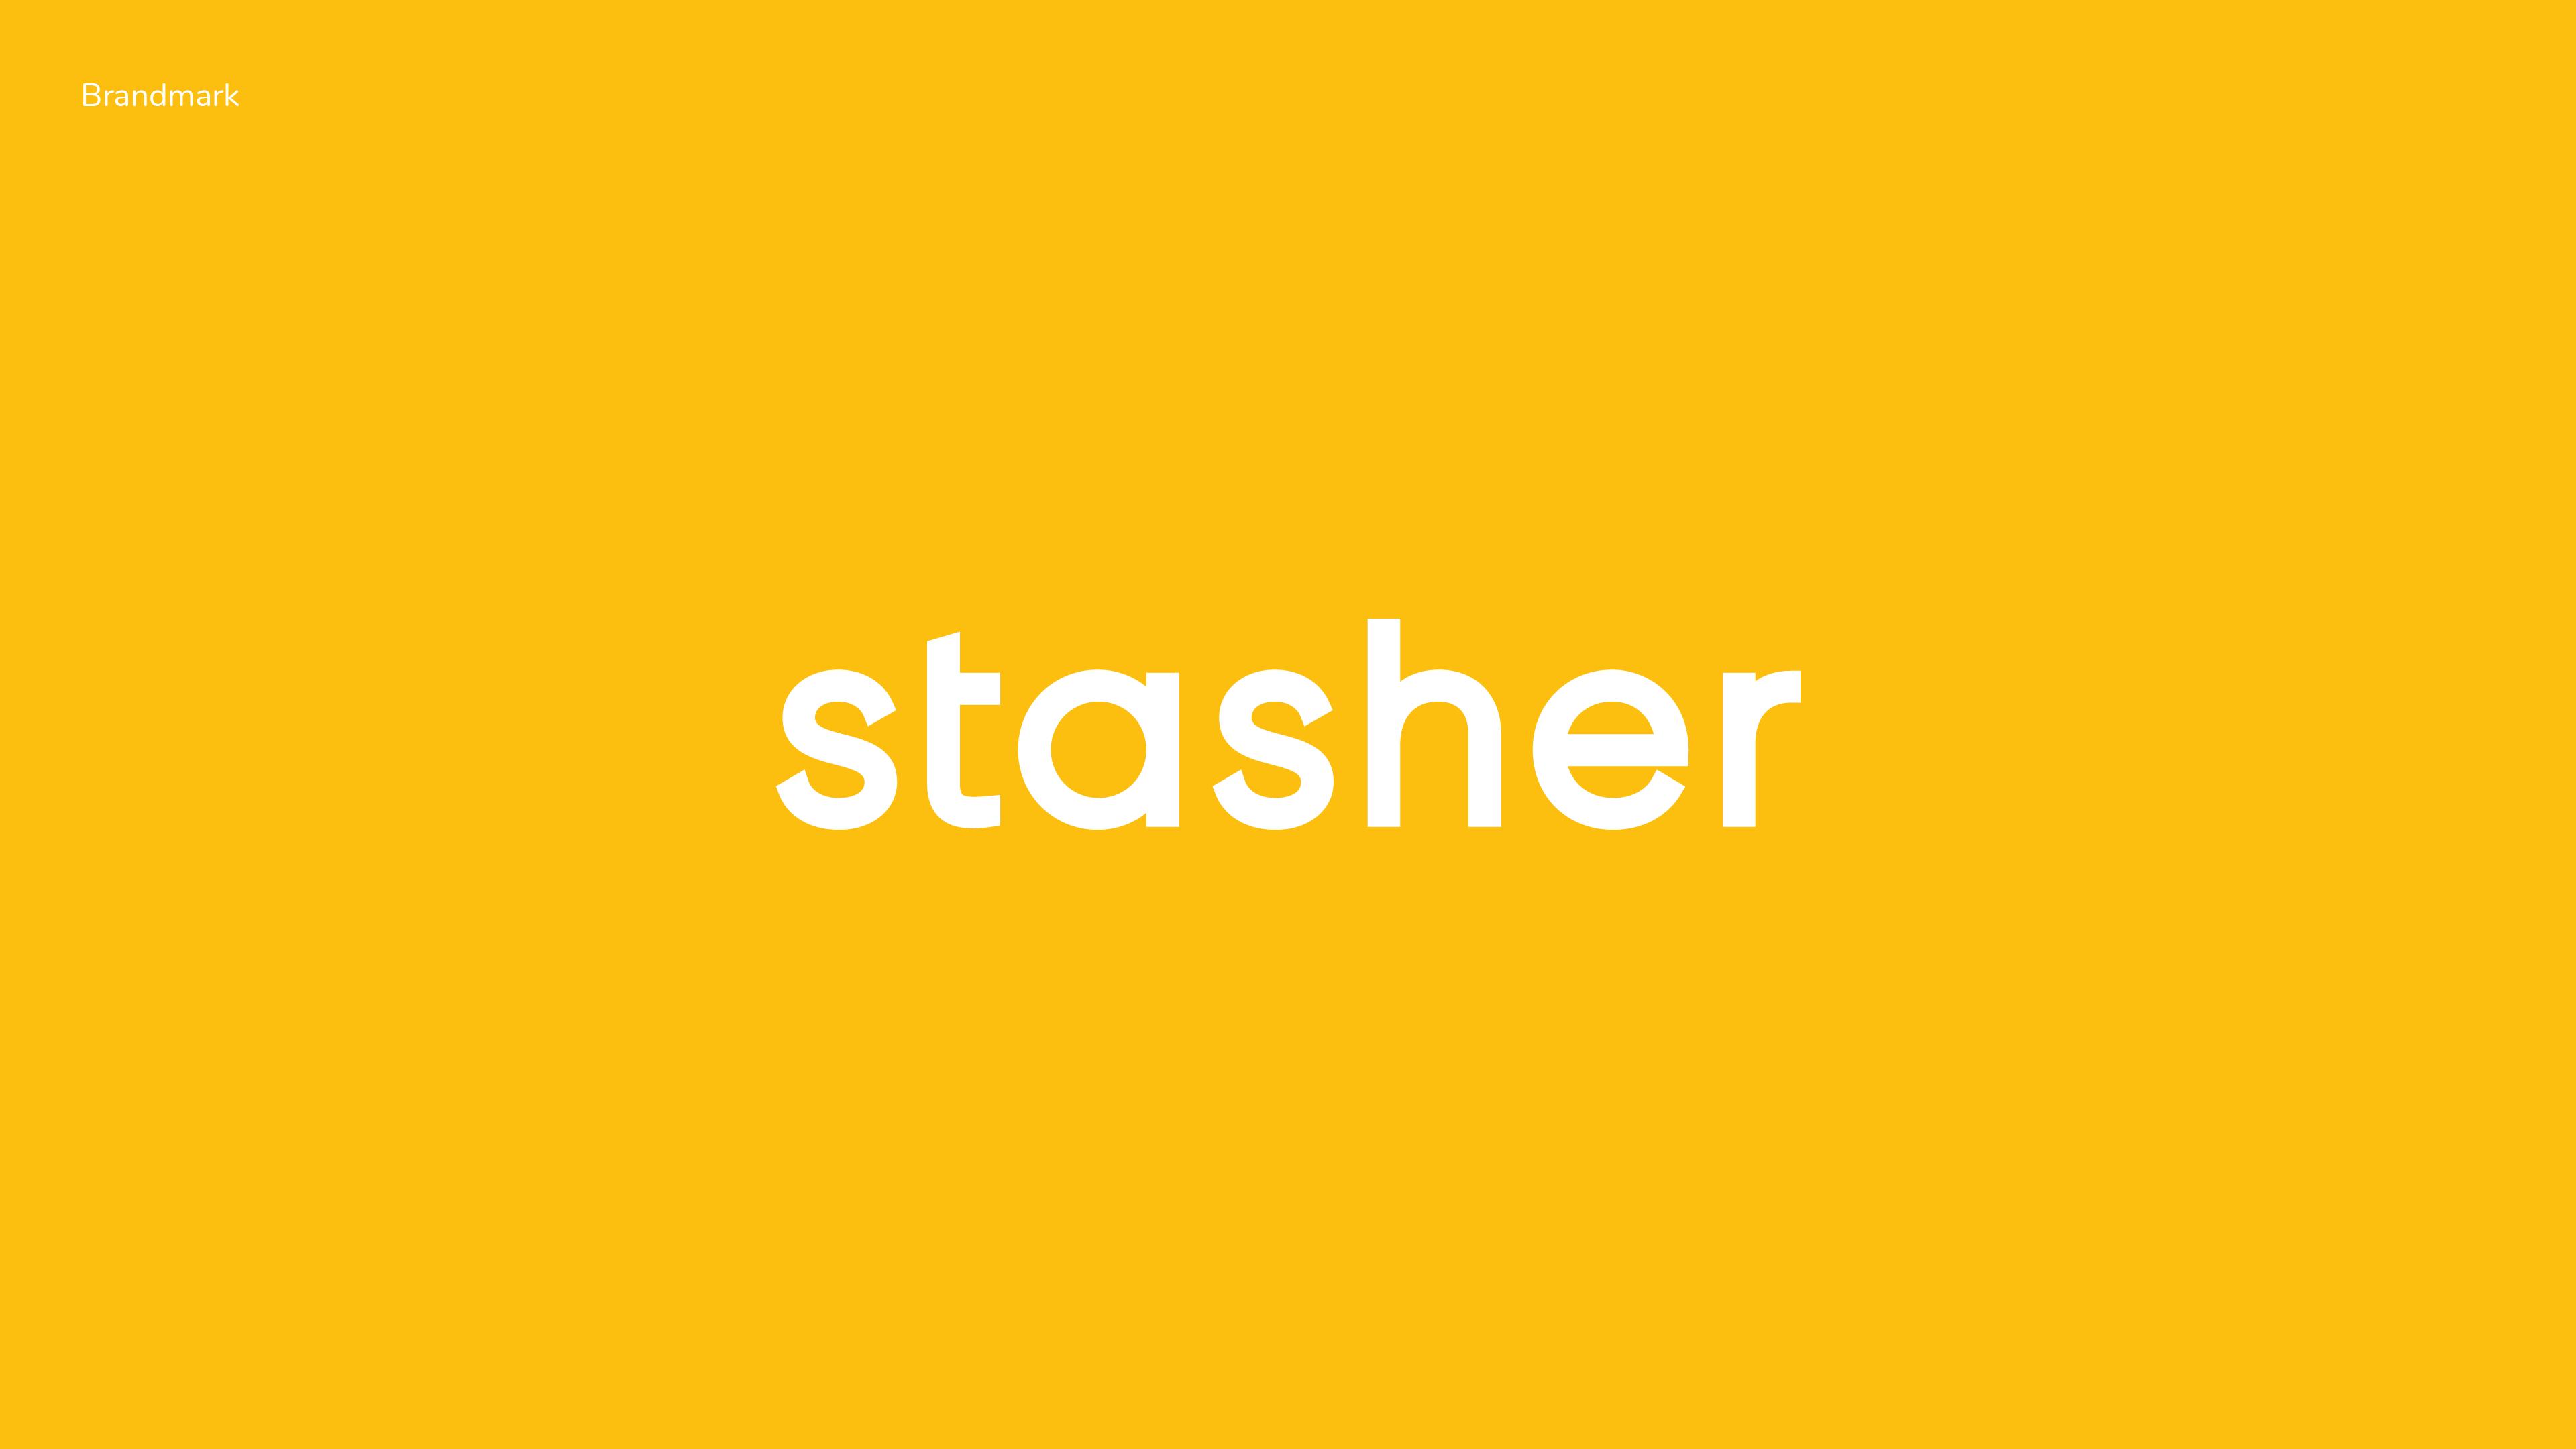 stasher_brandmark_2.0Artboard-1-copy-2@2x